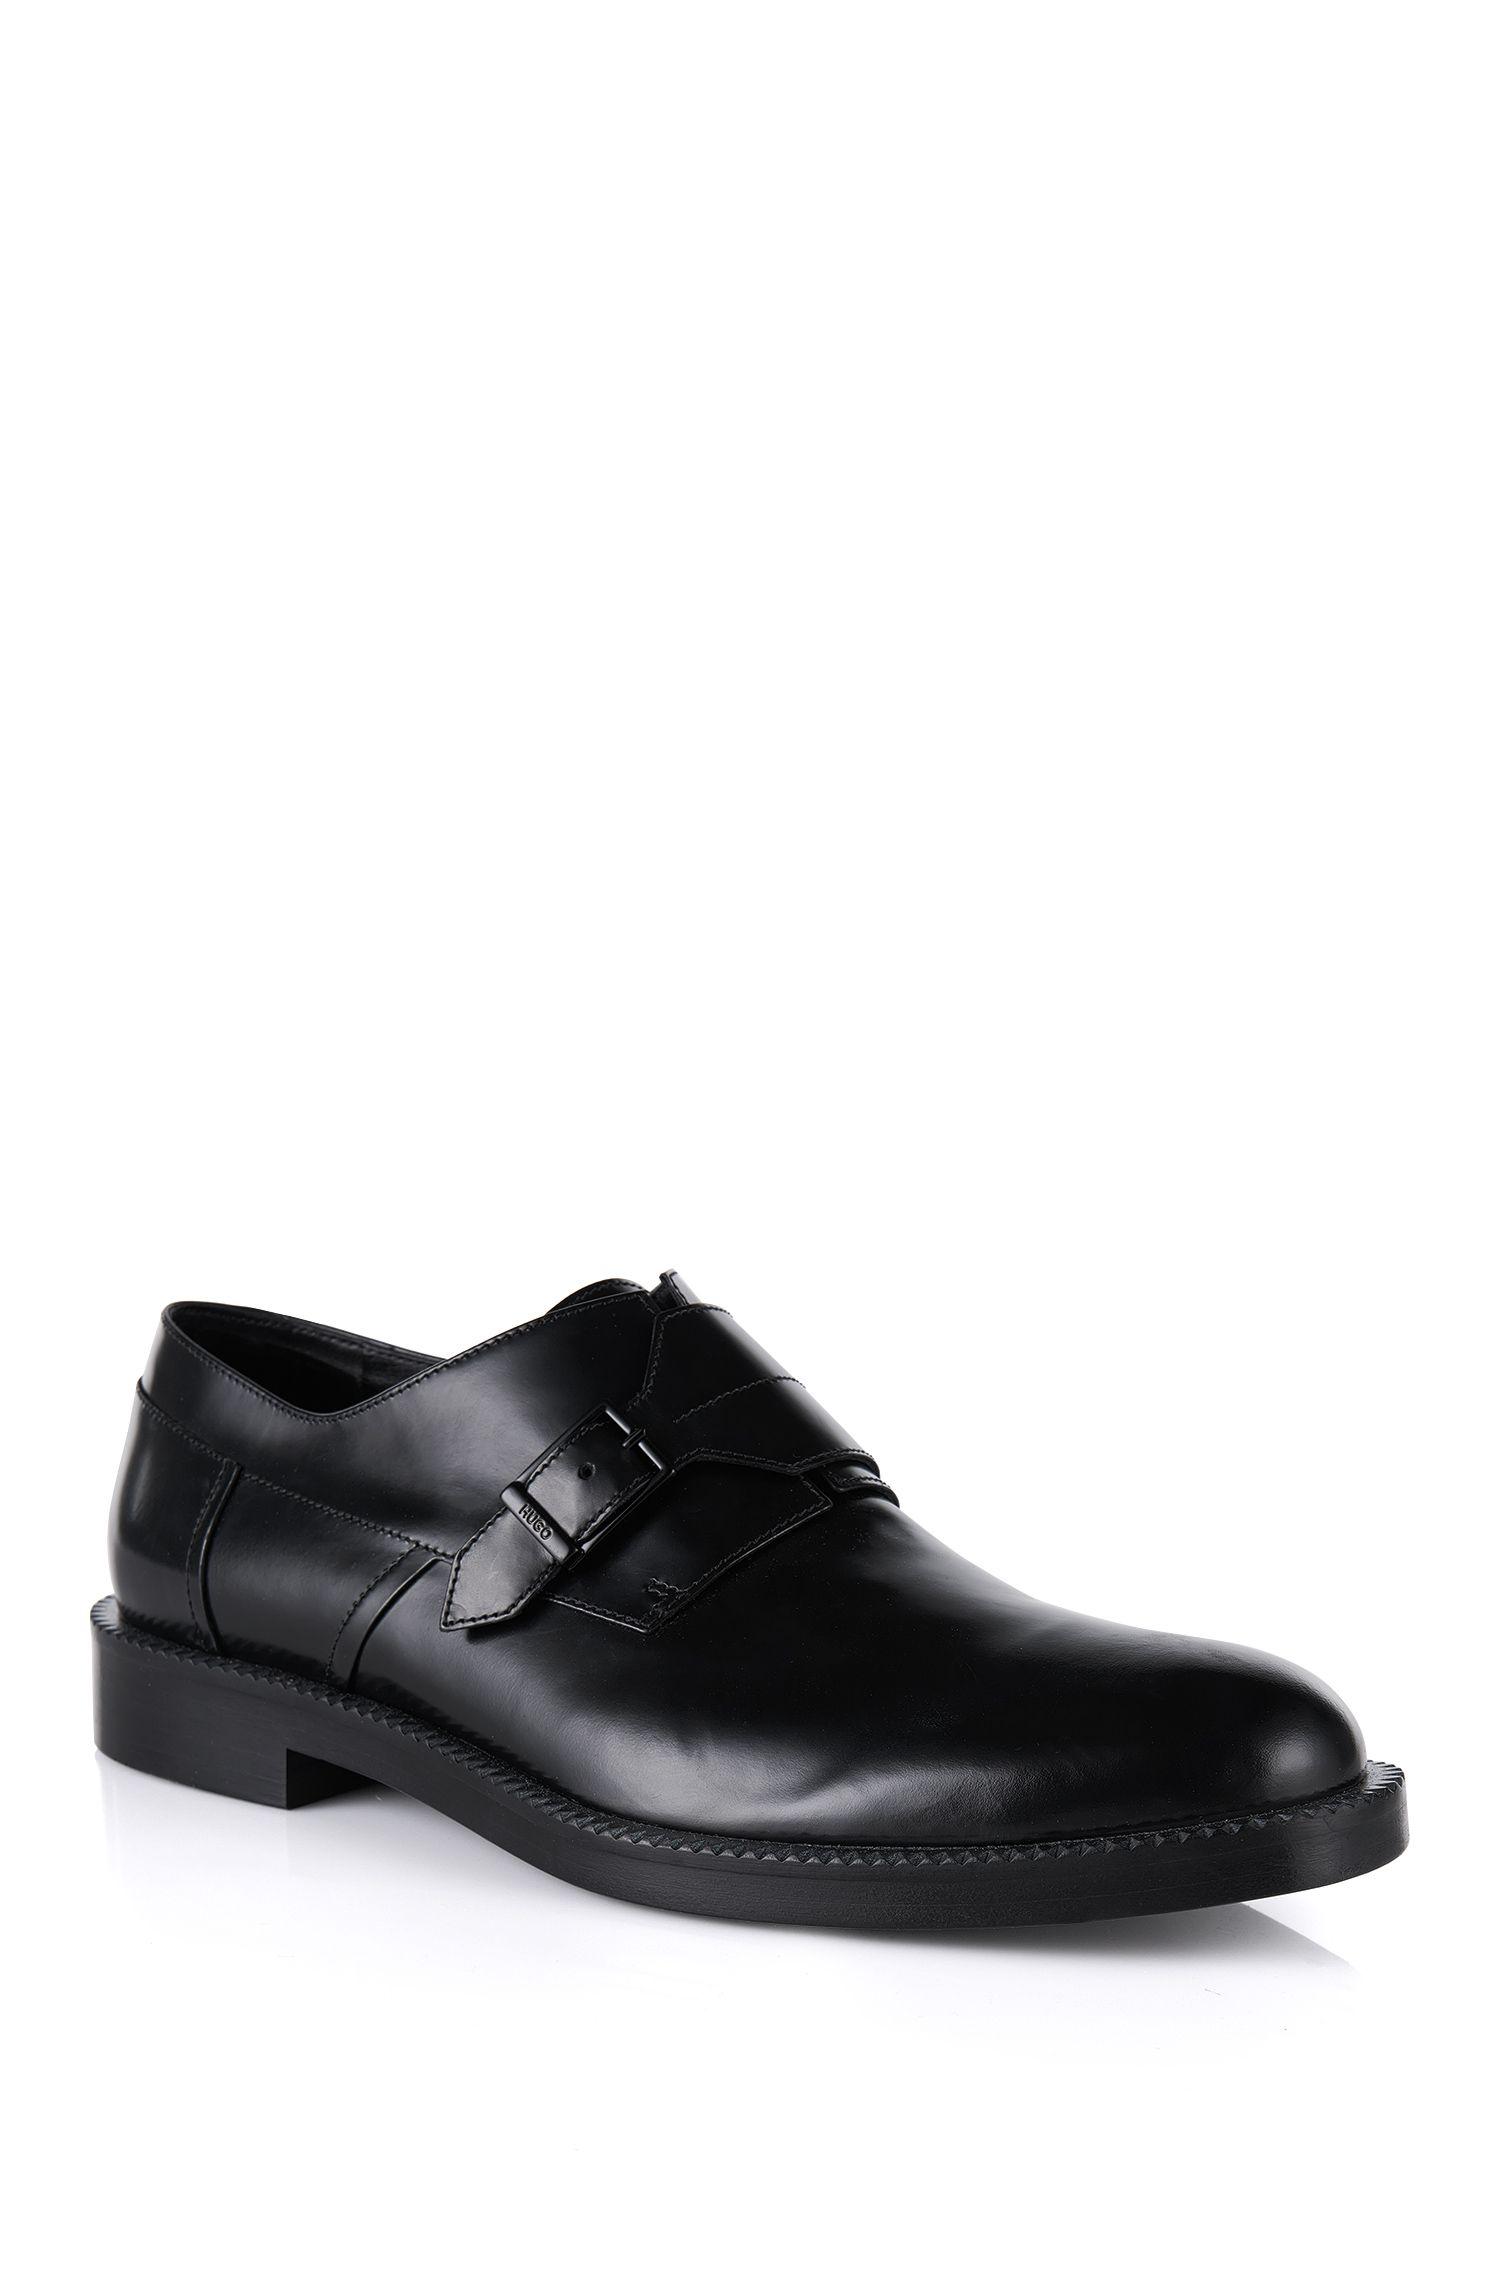 'Monomok' | Calfskin Monk Strap Shoes